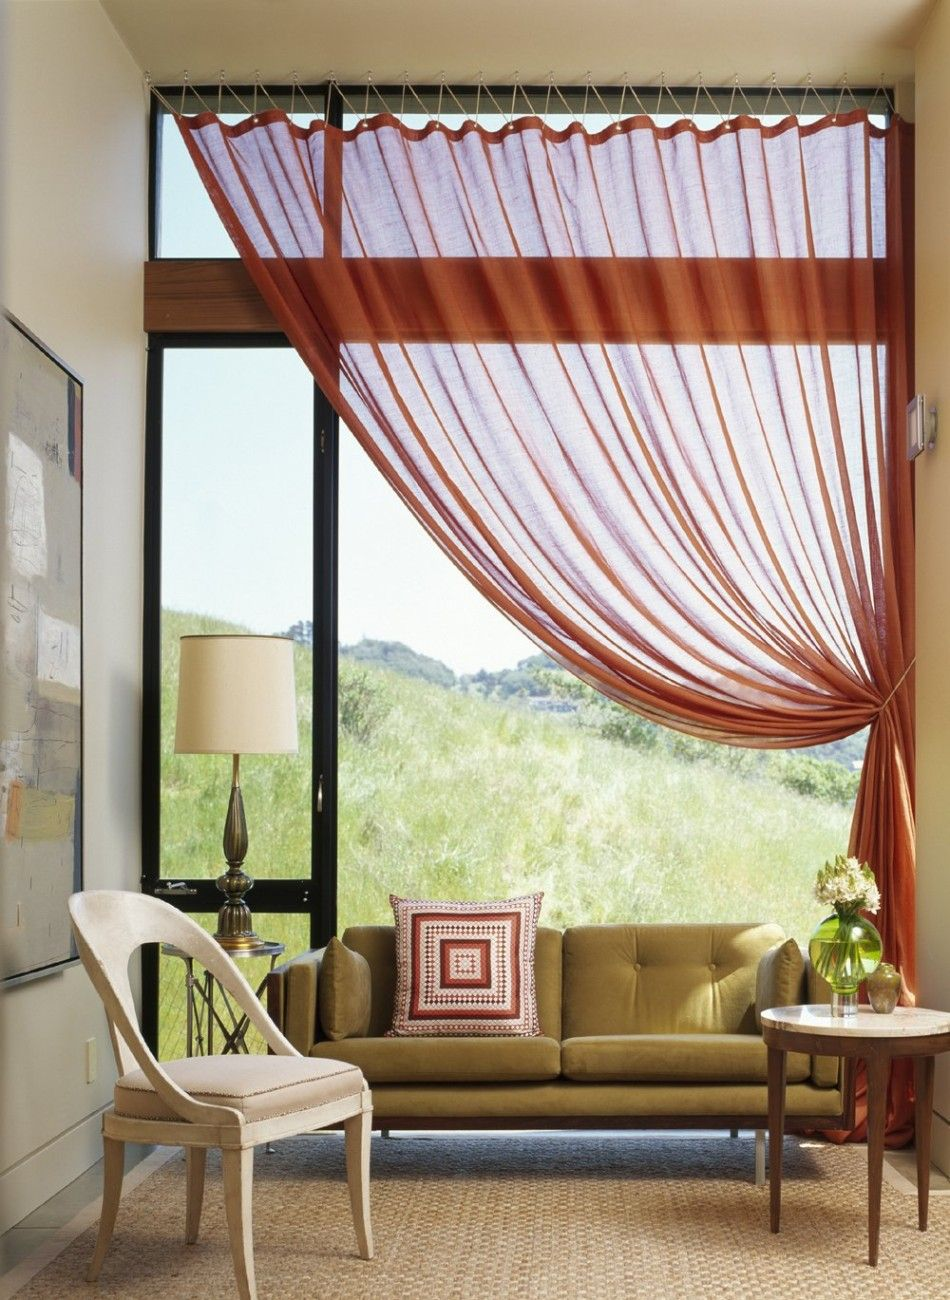 Bad designtrends window sheers  homes  المنازل  pinterest  window sheers window